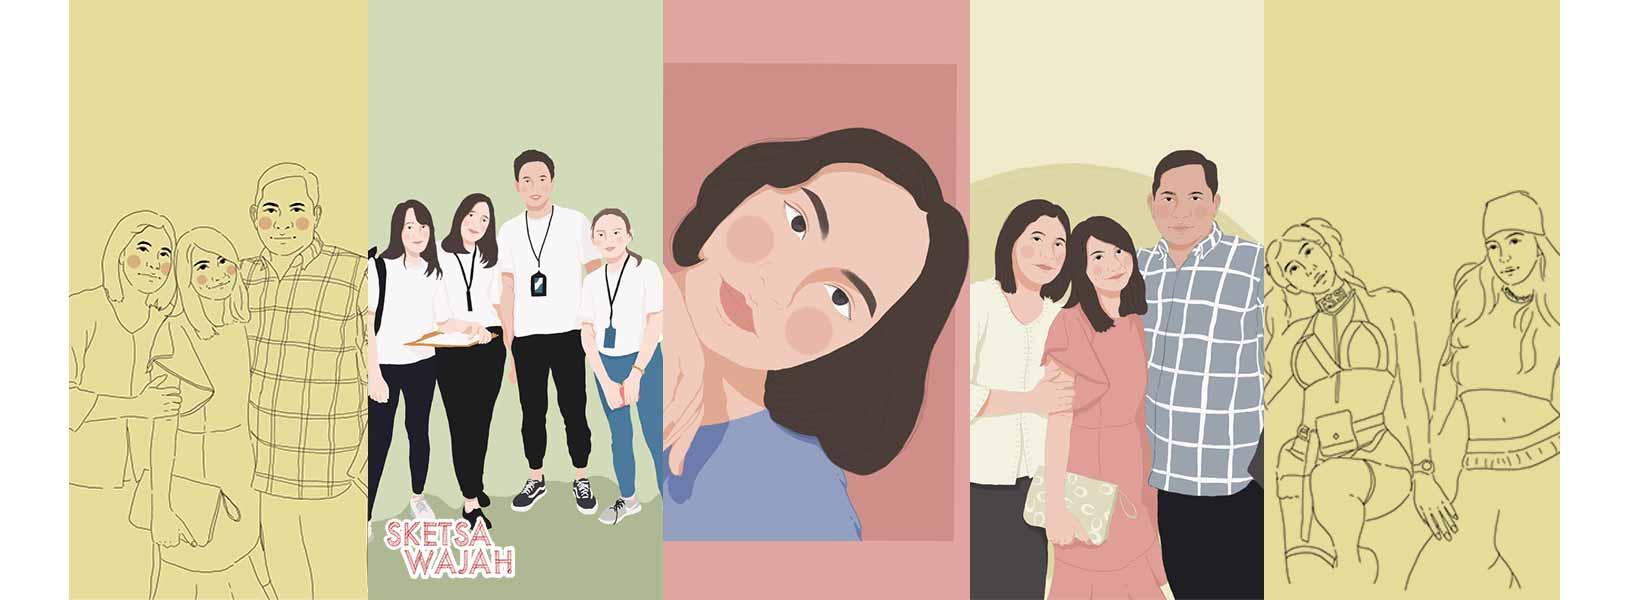 Karya Ikeshia Grace sketcher Sketsa Wajah